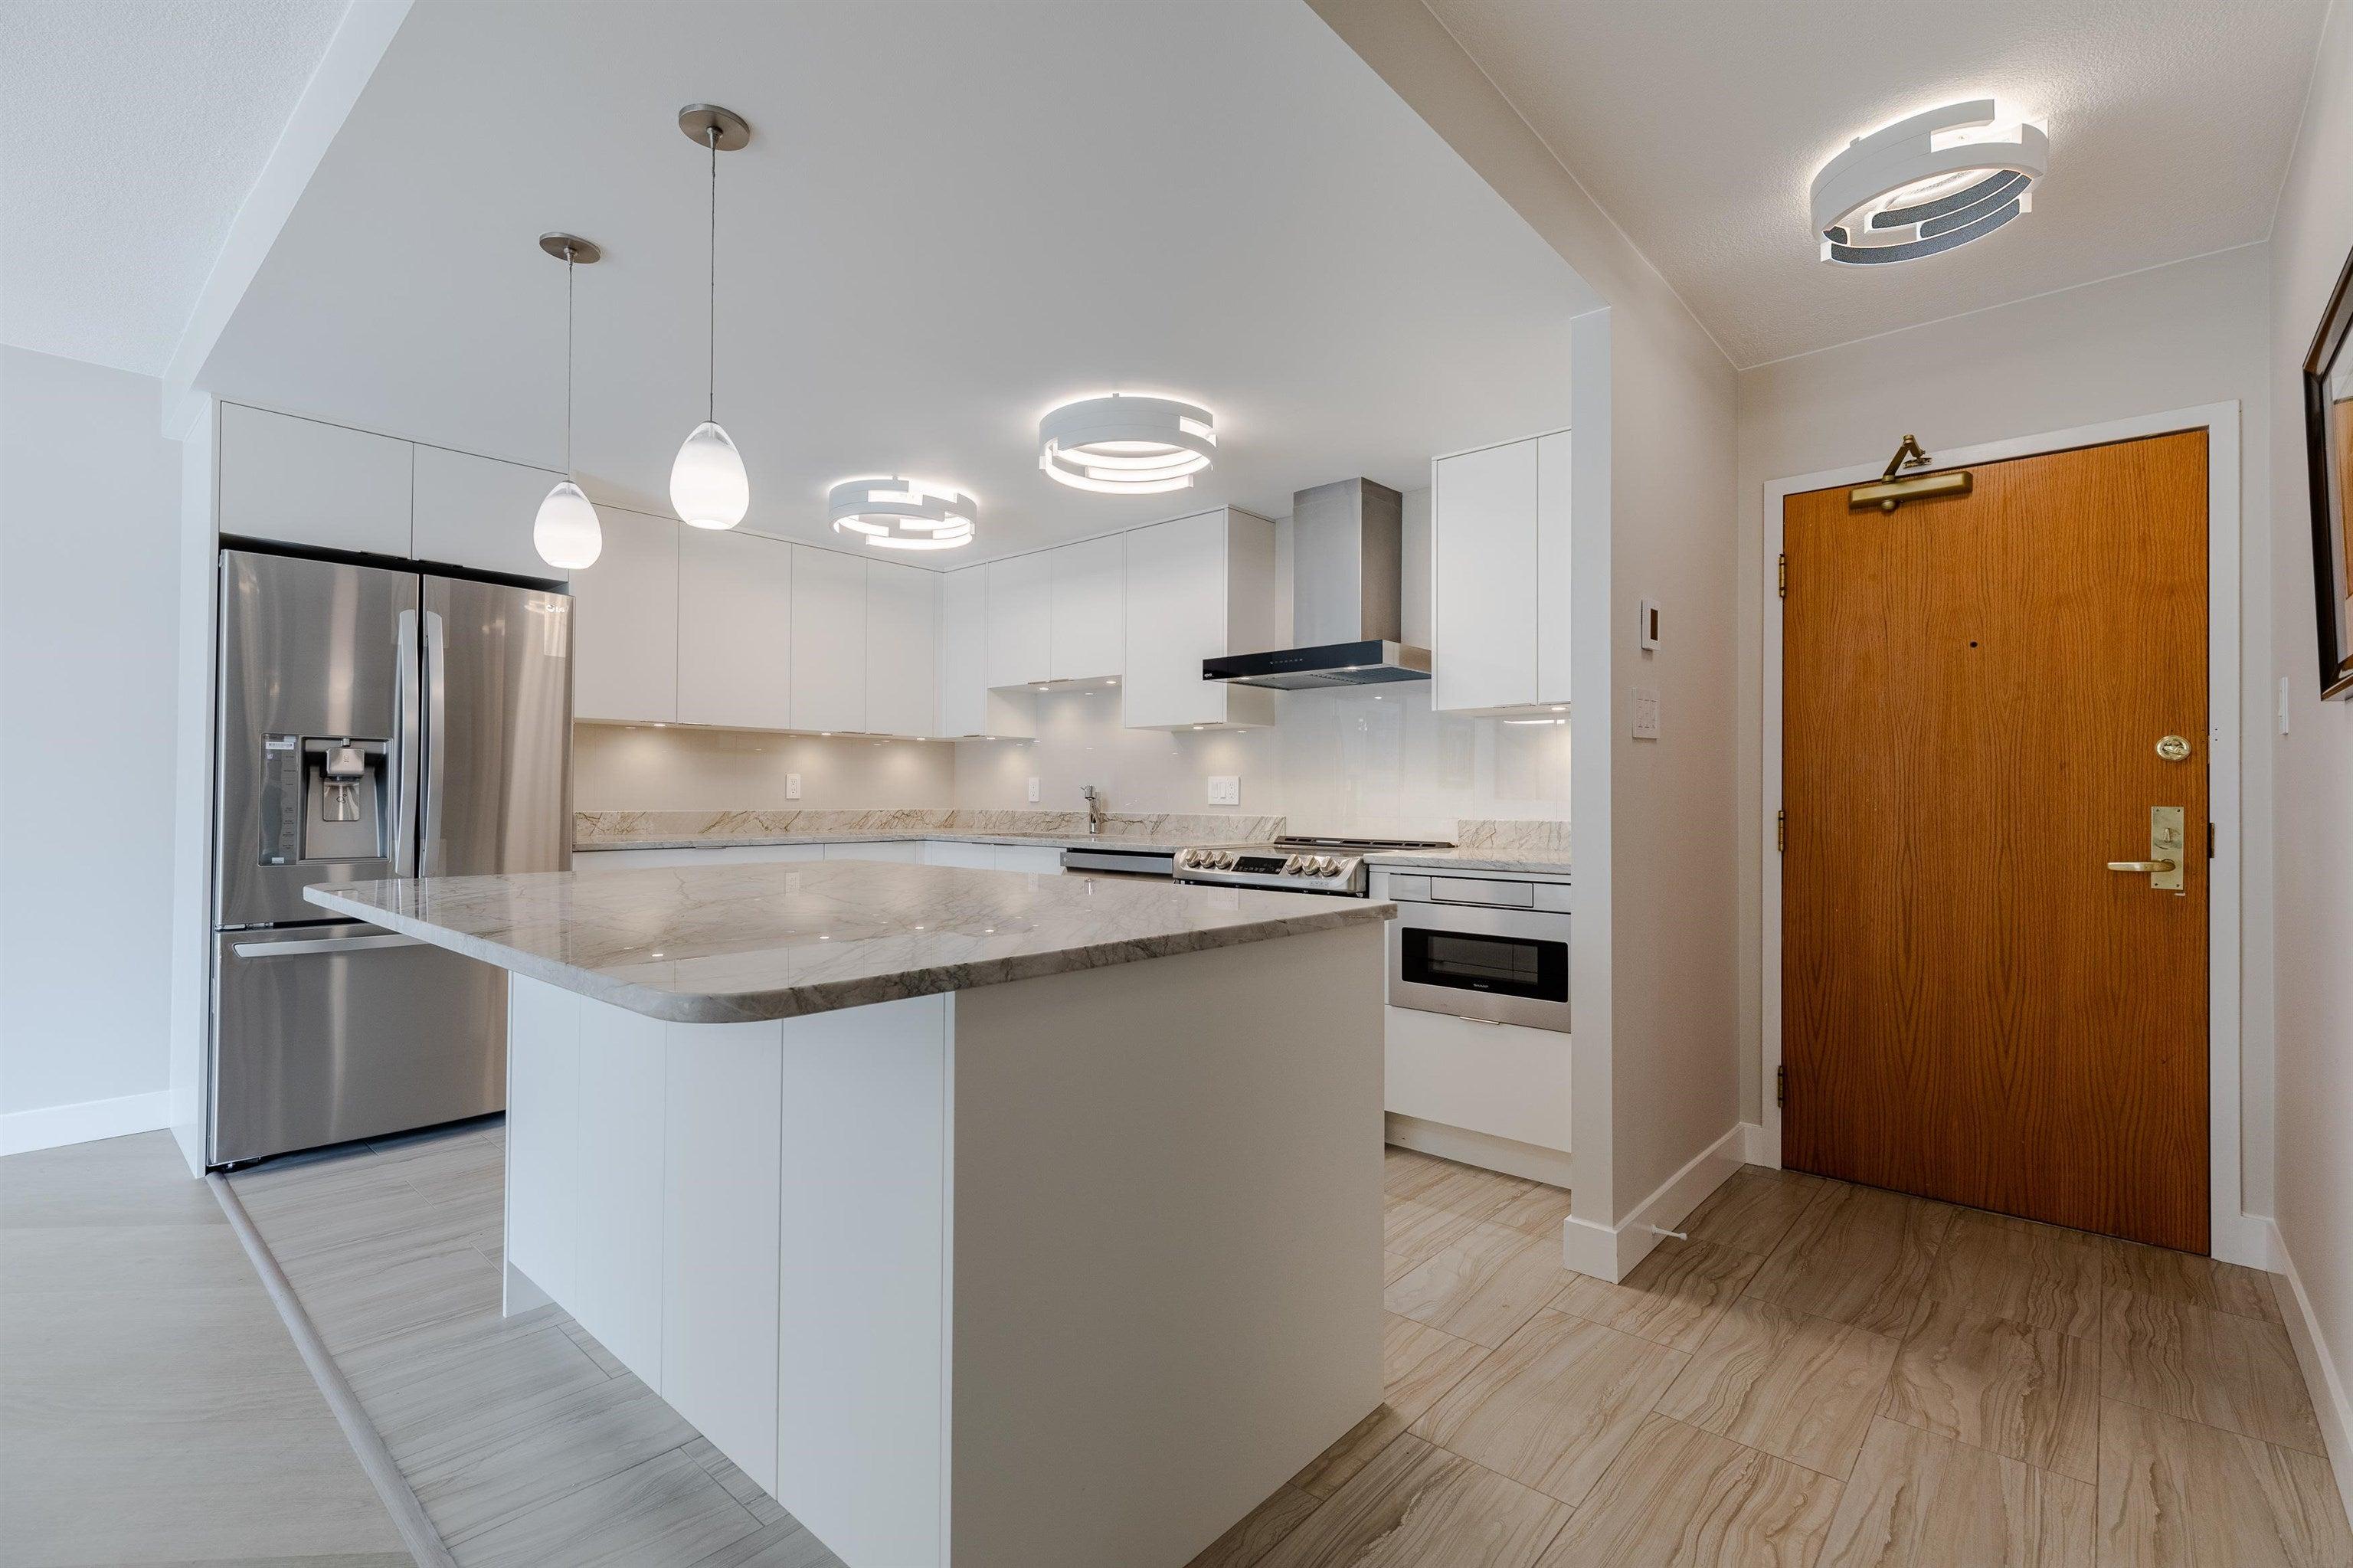 406 1450 PENNYFARTHING DRIVE - False Creek Apartment/Condo for sale, 2 Bedrooms (R2617259) - #12